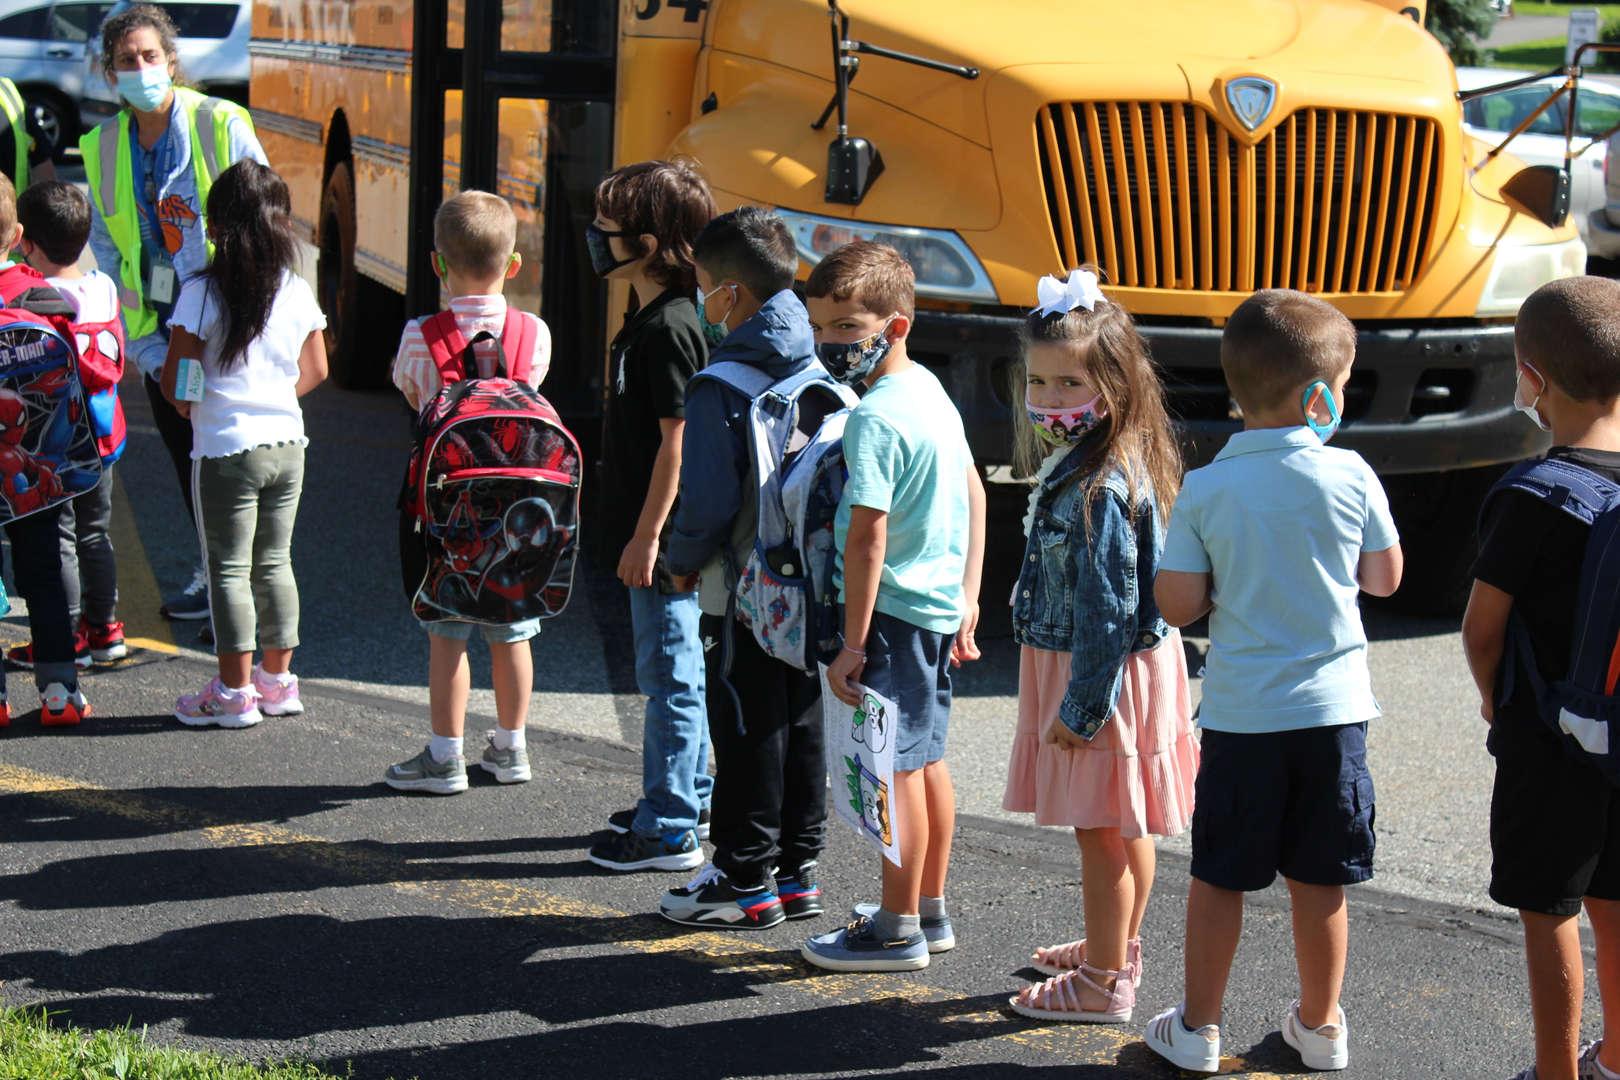 Kindergarten students waiting to board bus.